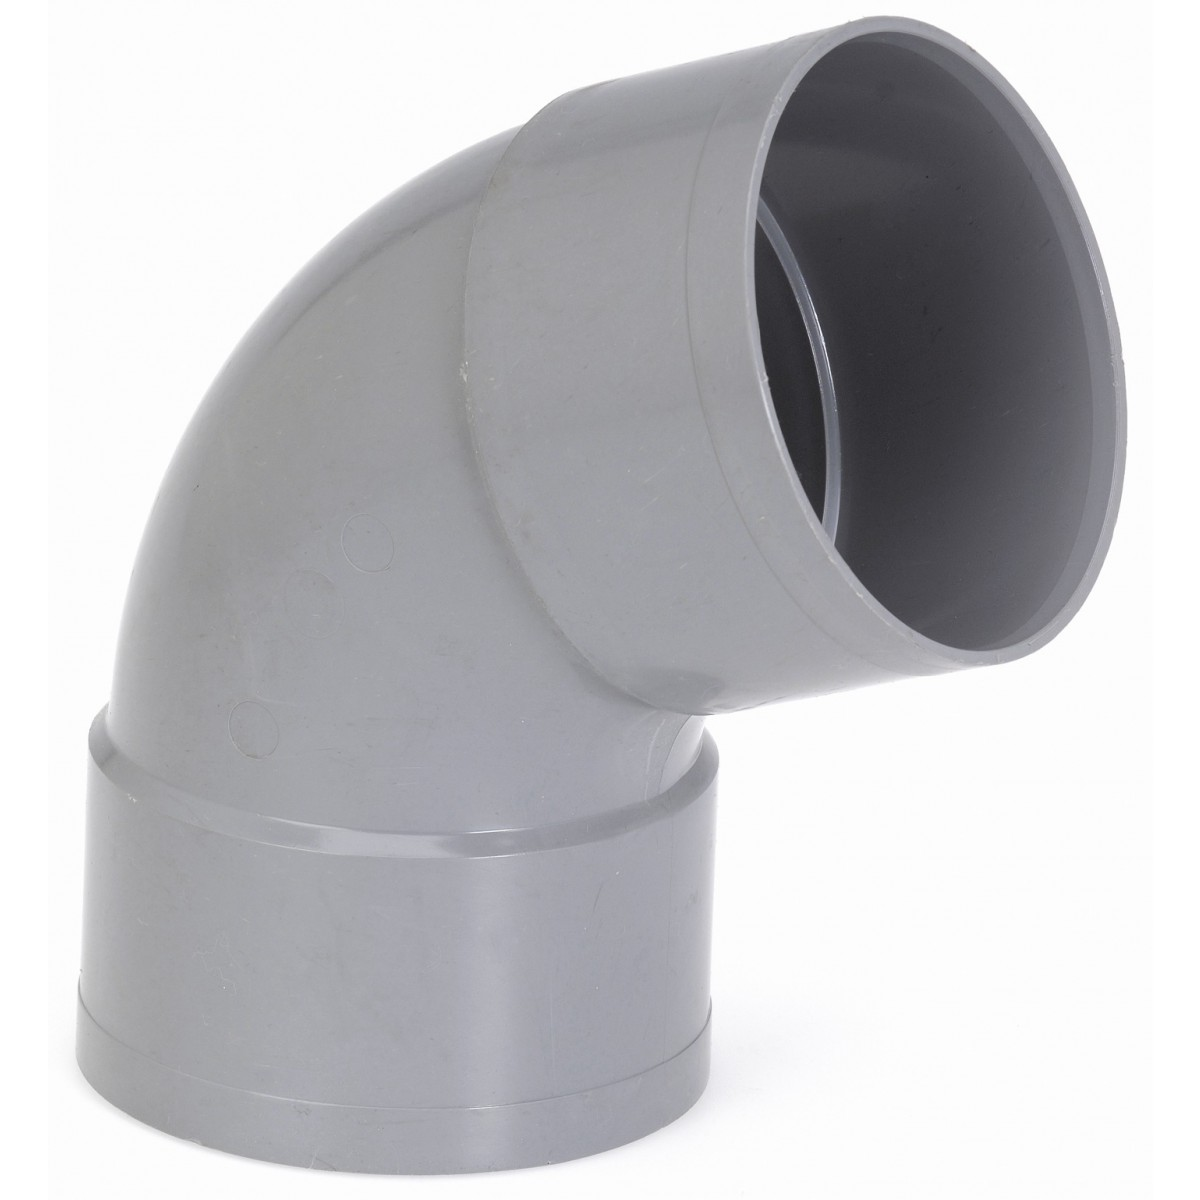 Coude à 67°30 Femelle / Femelle Girpi - Diamètre 40 mm